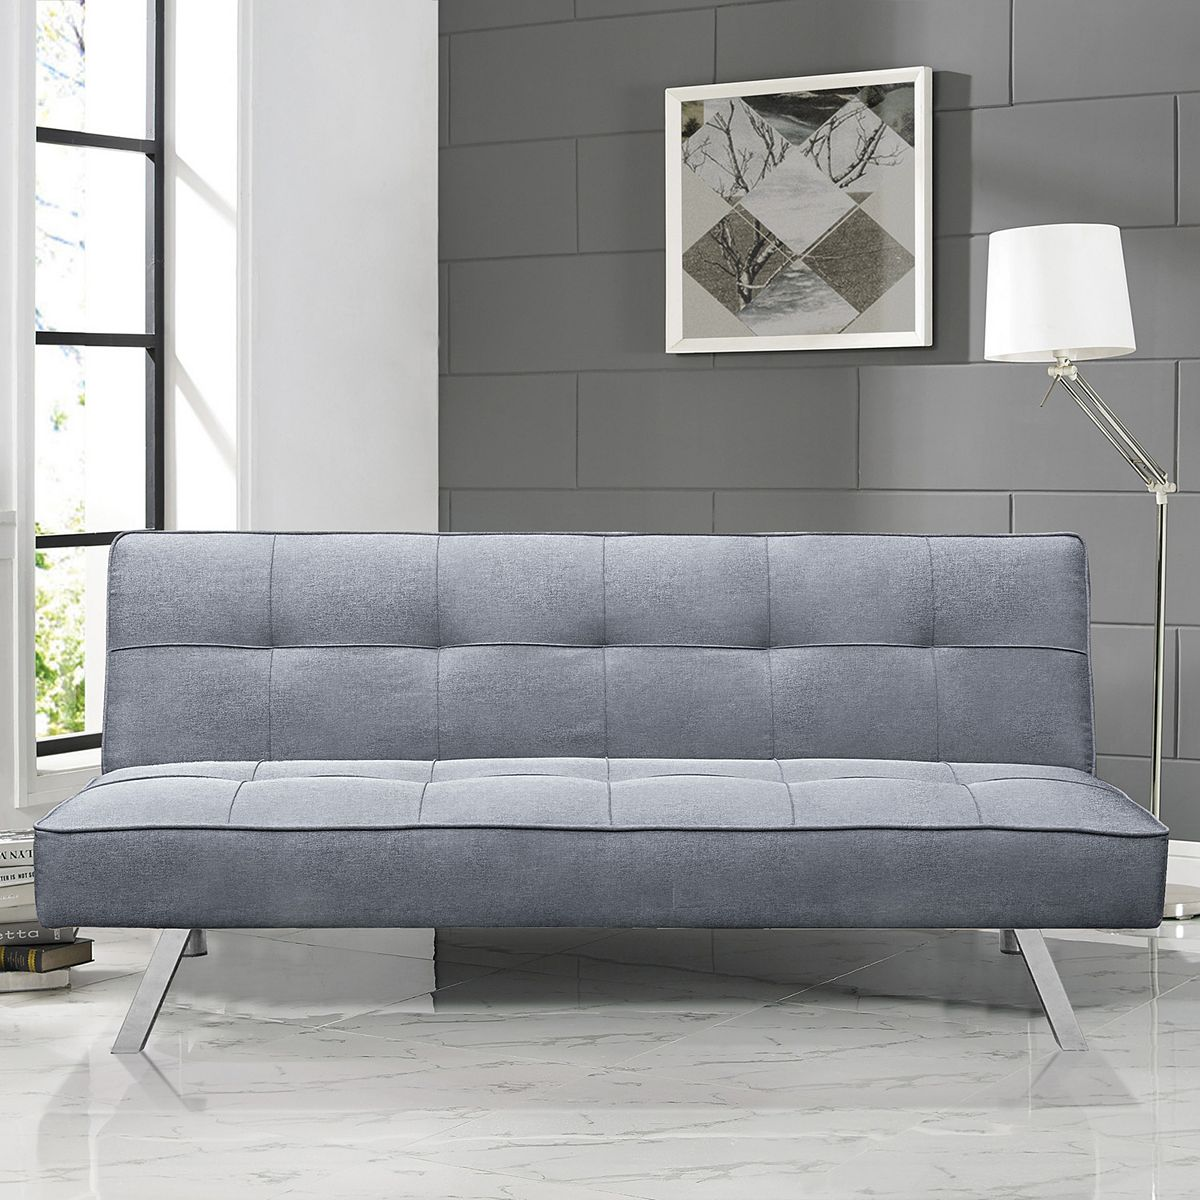 Serta Chelsea 3 Seat Multi function Upholstery Fabric ...